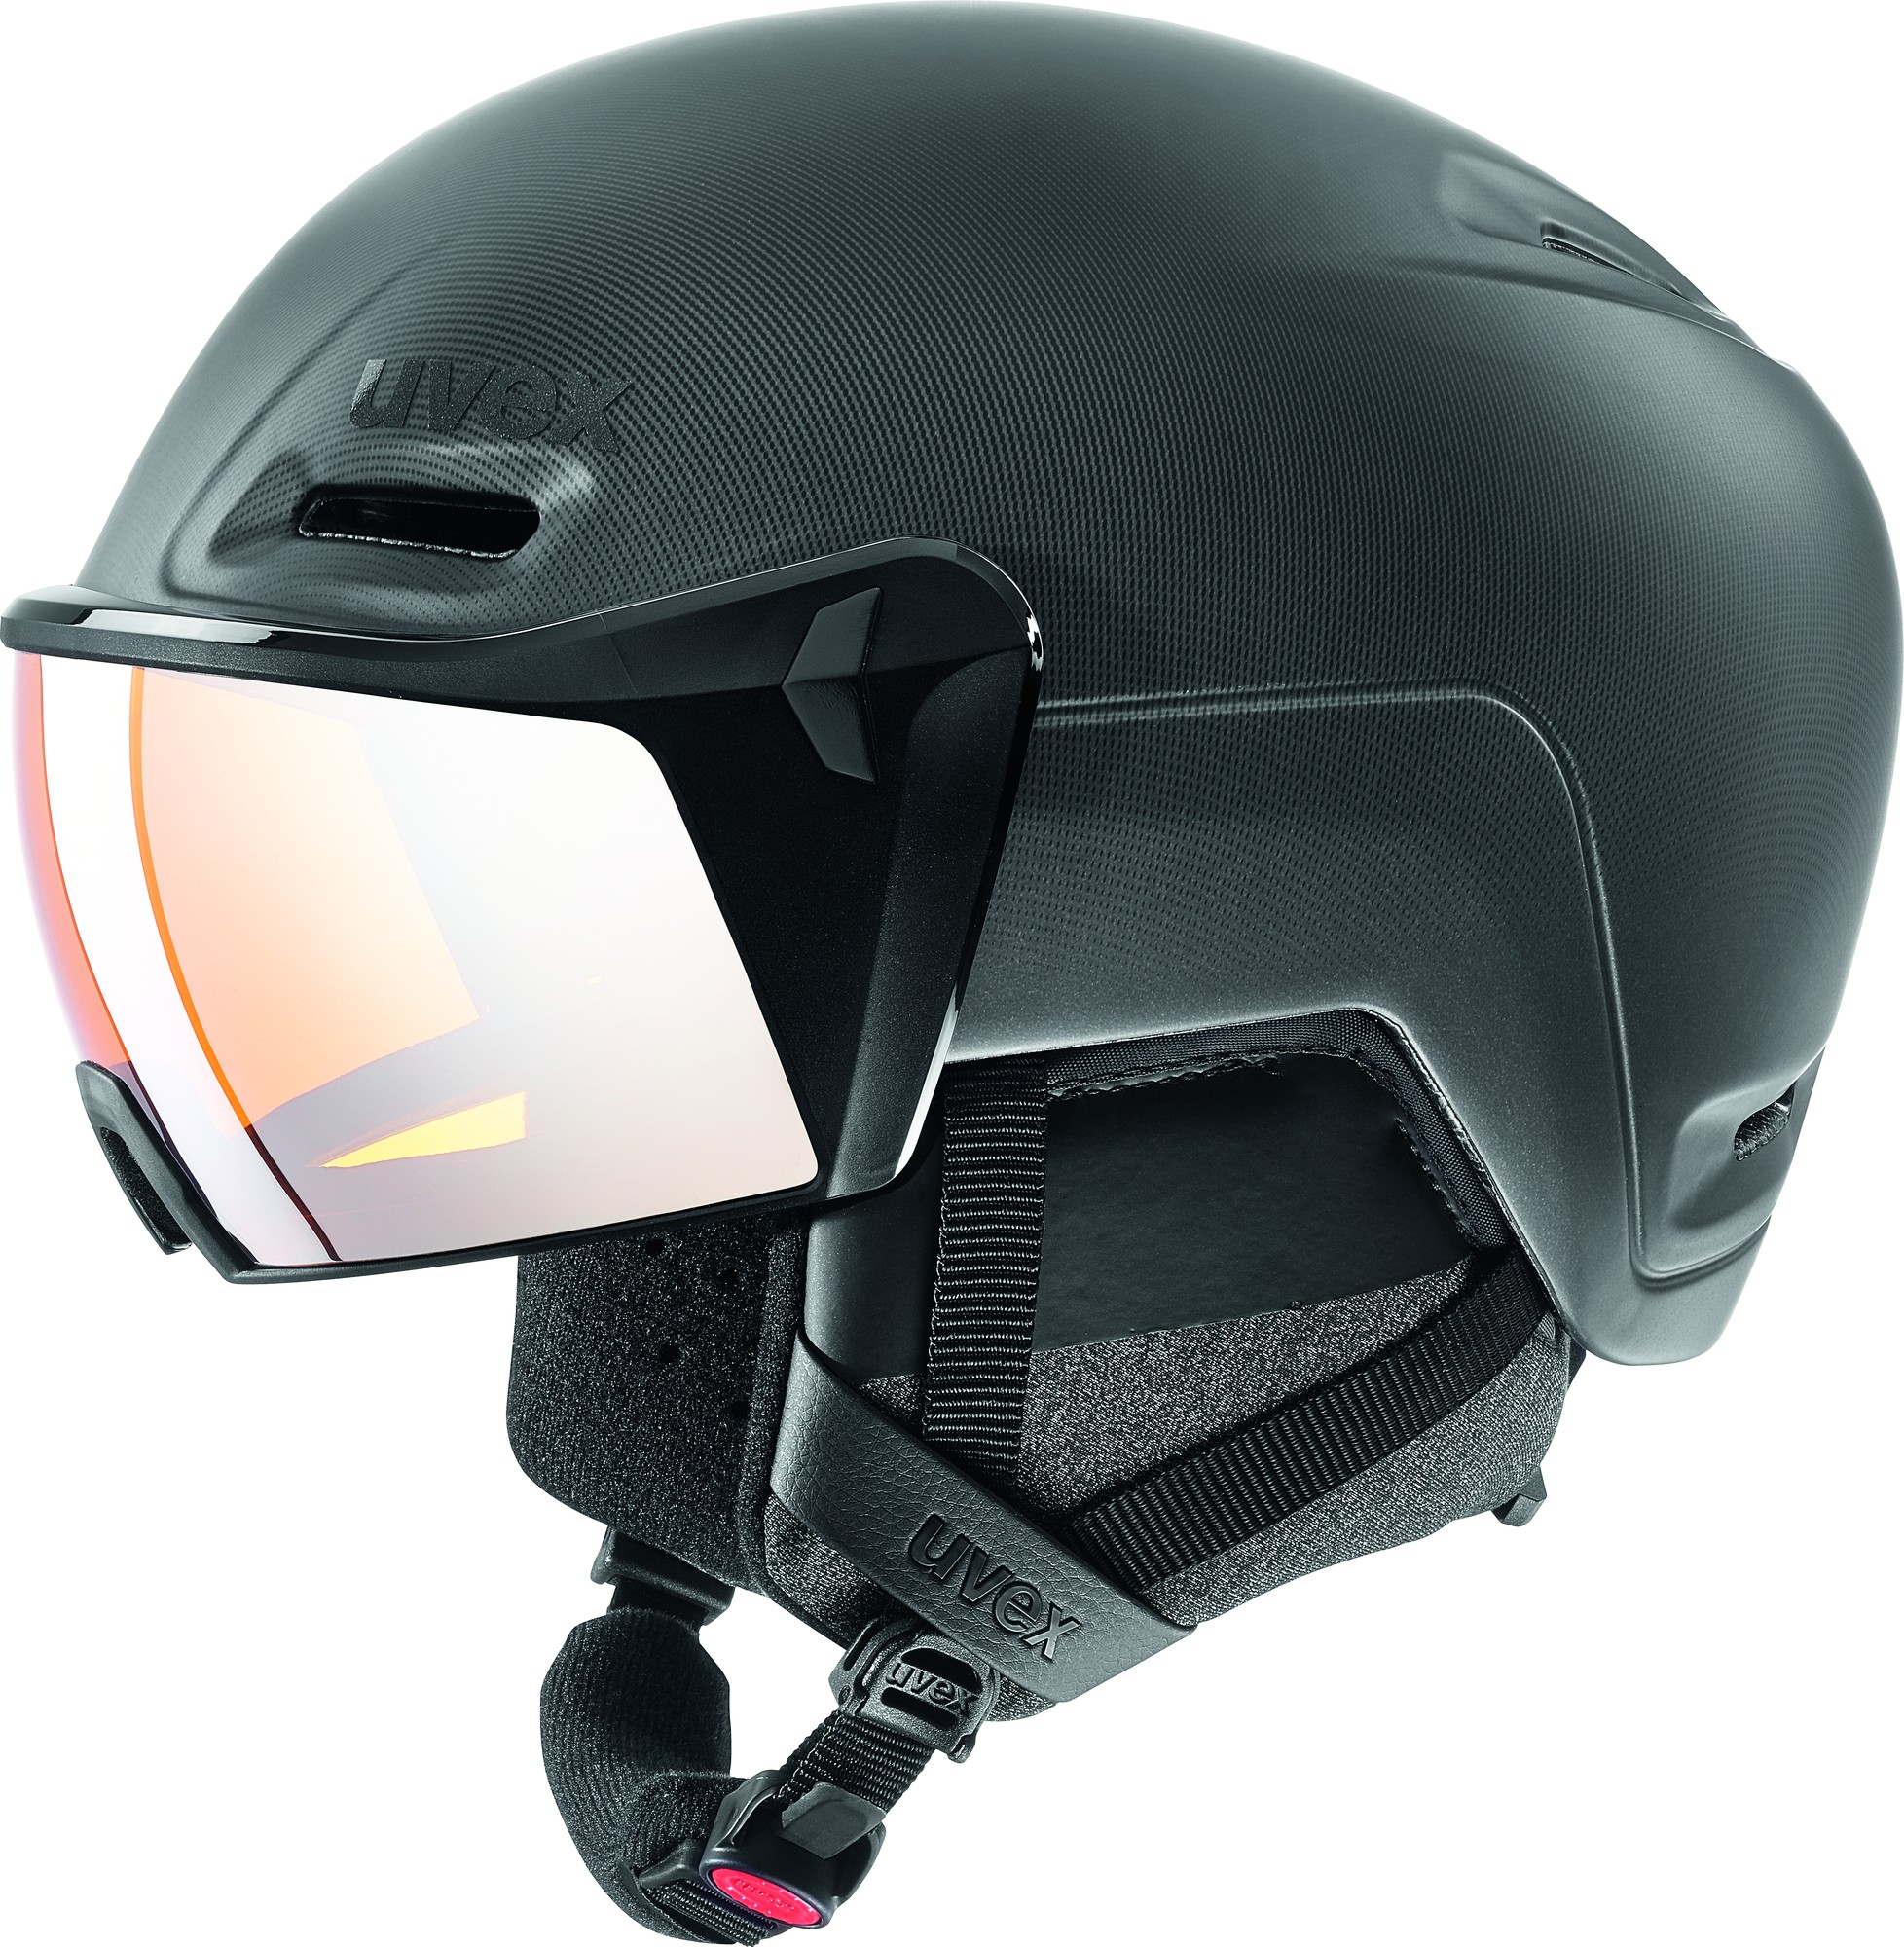 Uvex Шлем Uvex Hlmt 700 шлем горнолыжный uvex oversize helmet цвет черный матовый размер 60 64